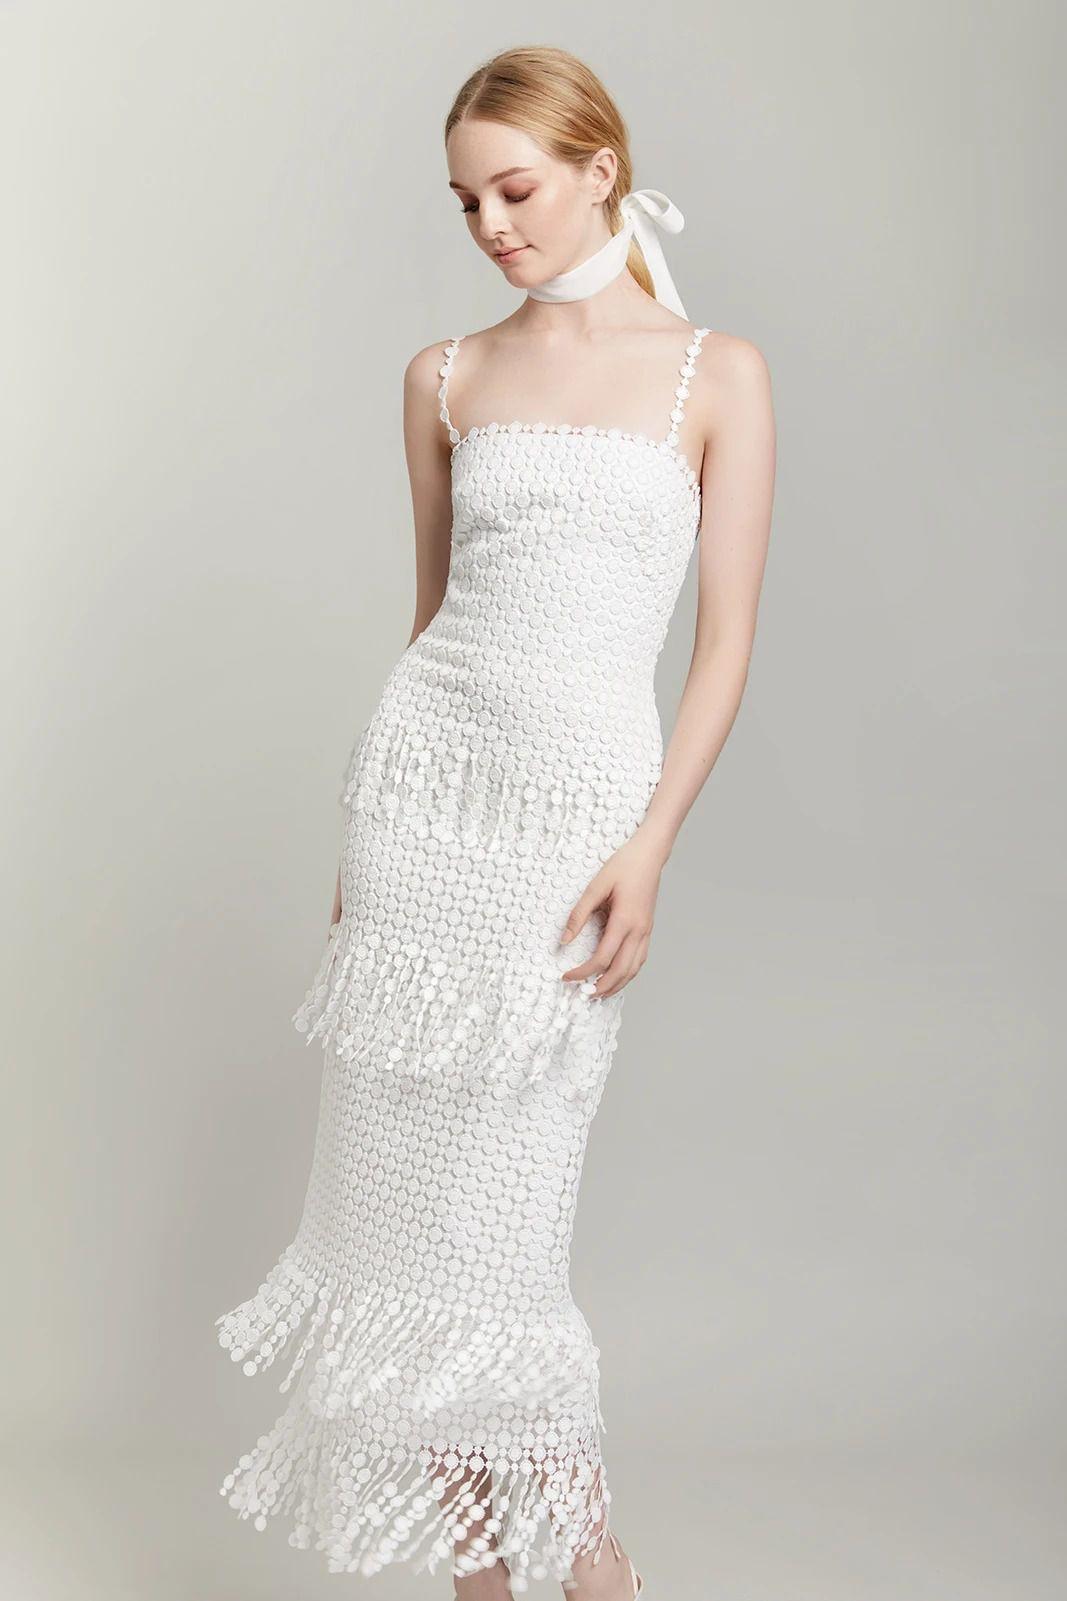 Lela Rose The Dawson Sheath Dress with spaghetti straps